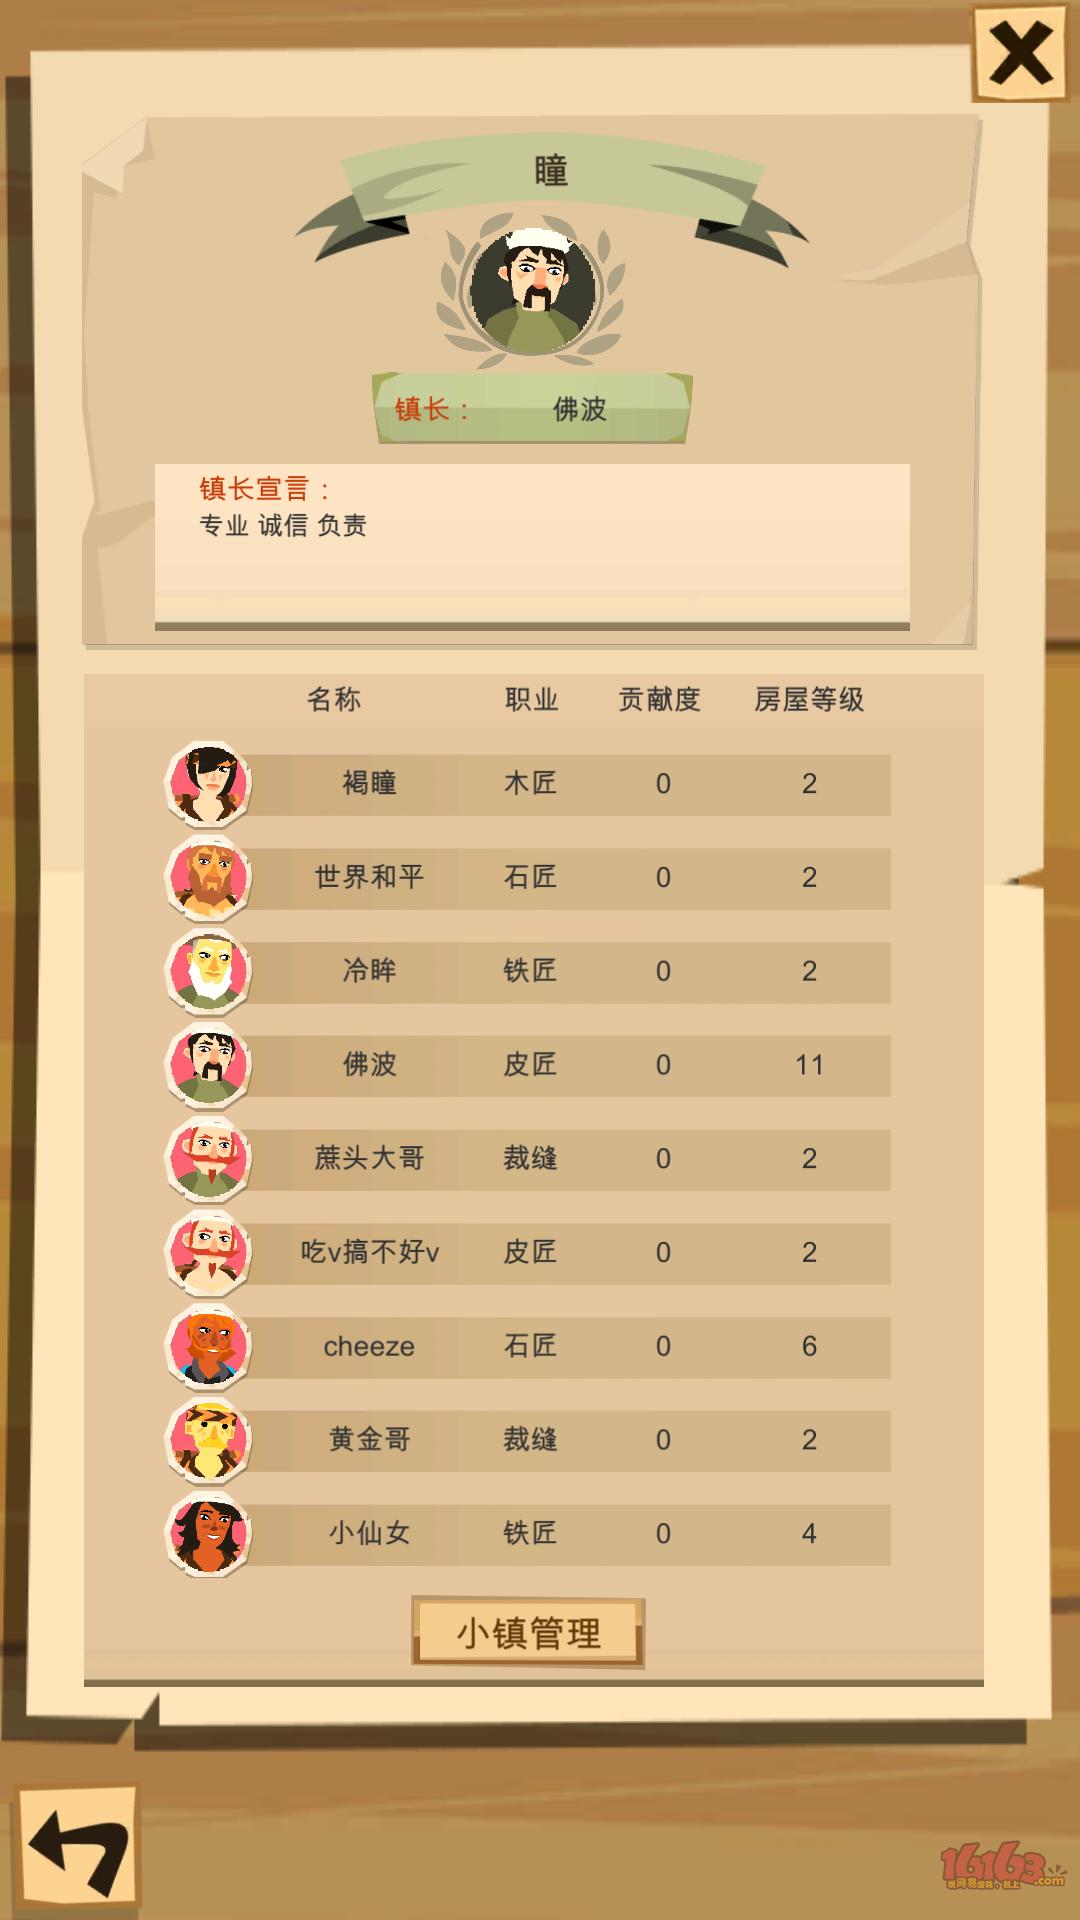 Screenshot_2018-02-12-20-40-31-137_com.netease.ma71.mi.png